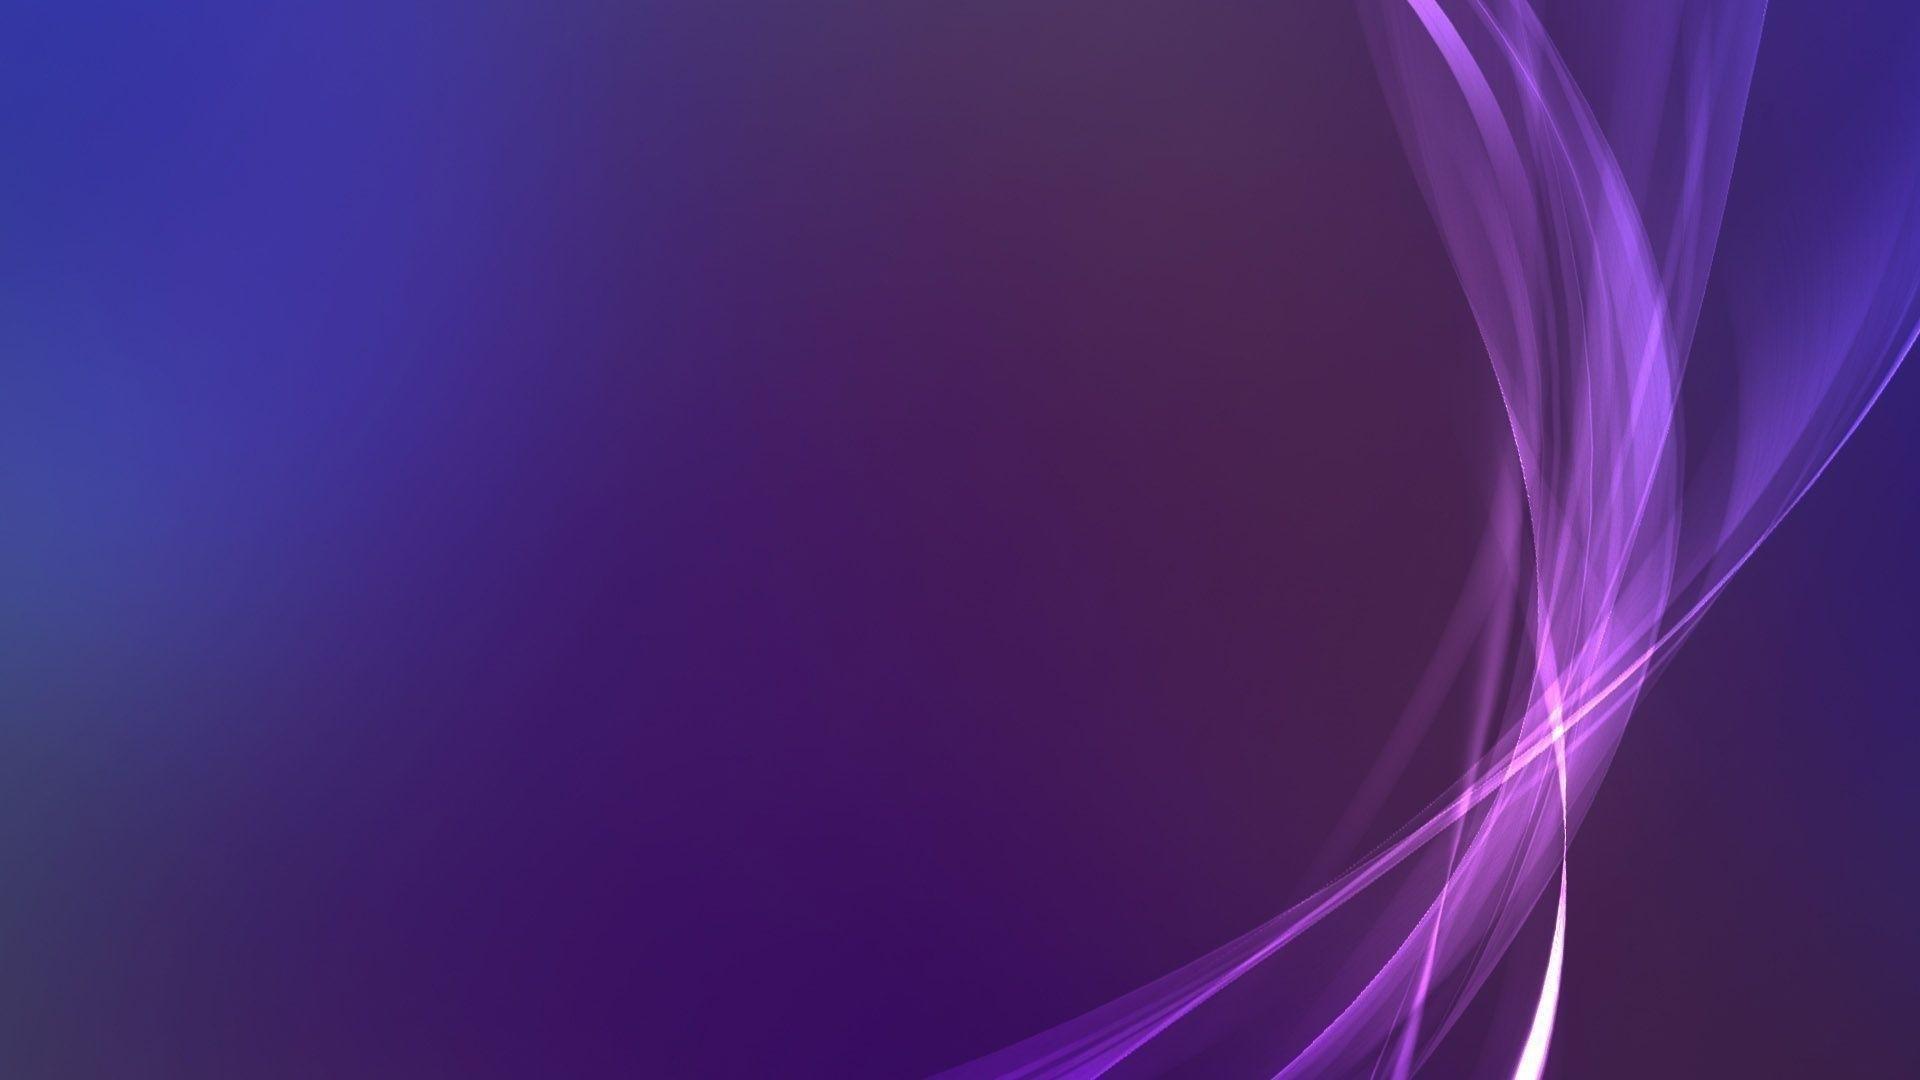 Light Purple High Quality